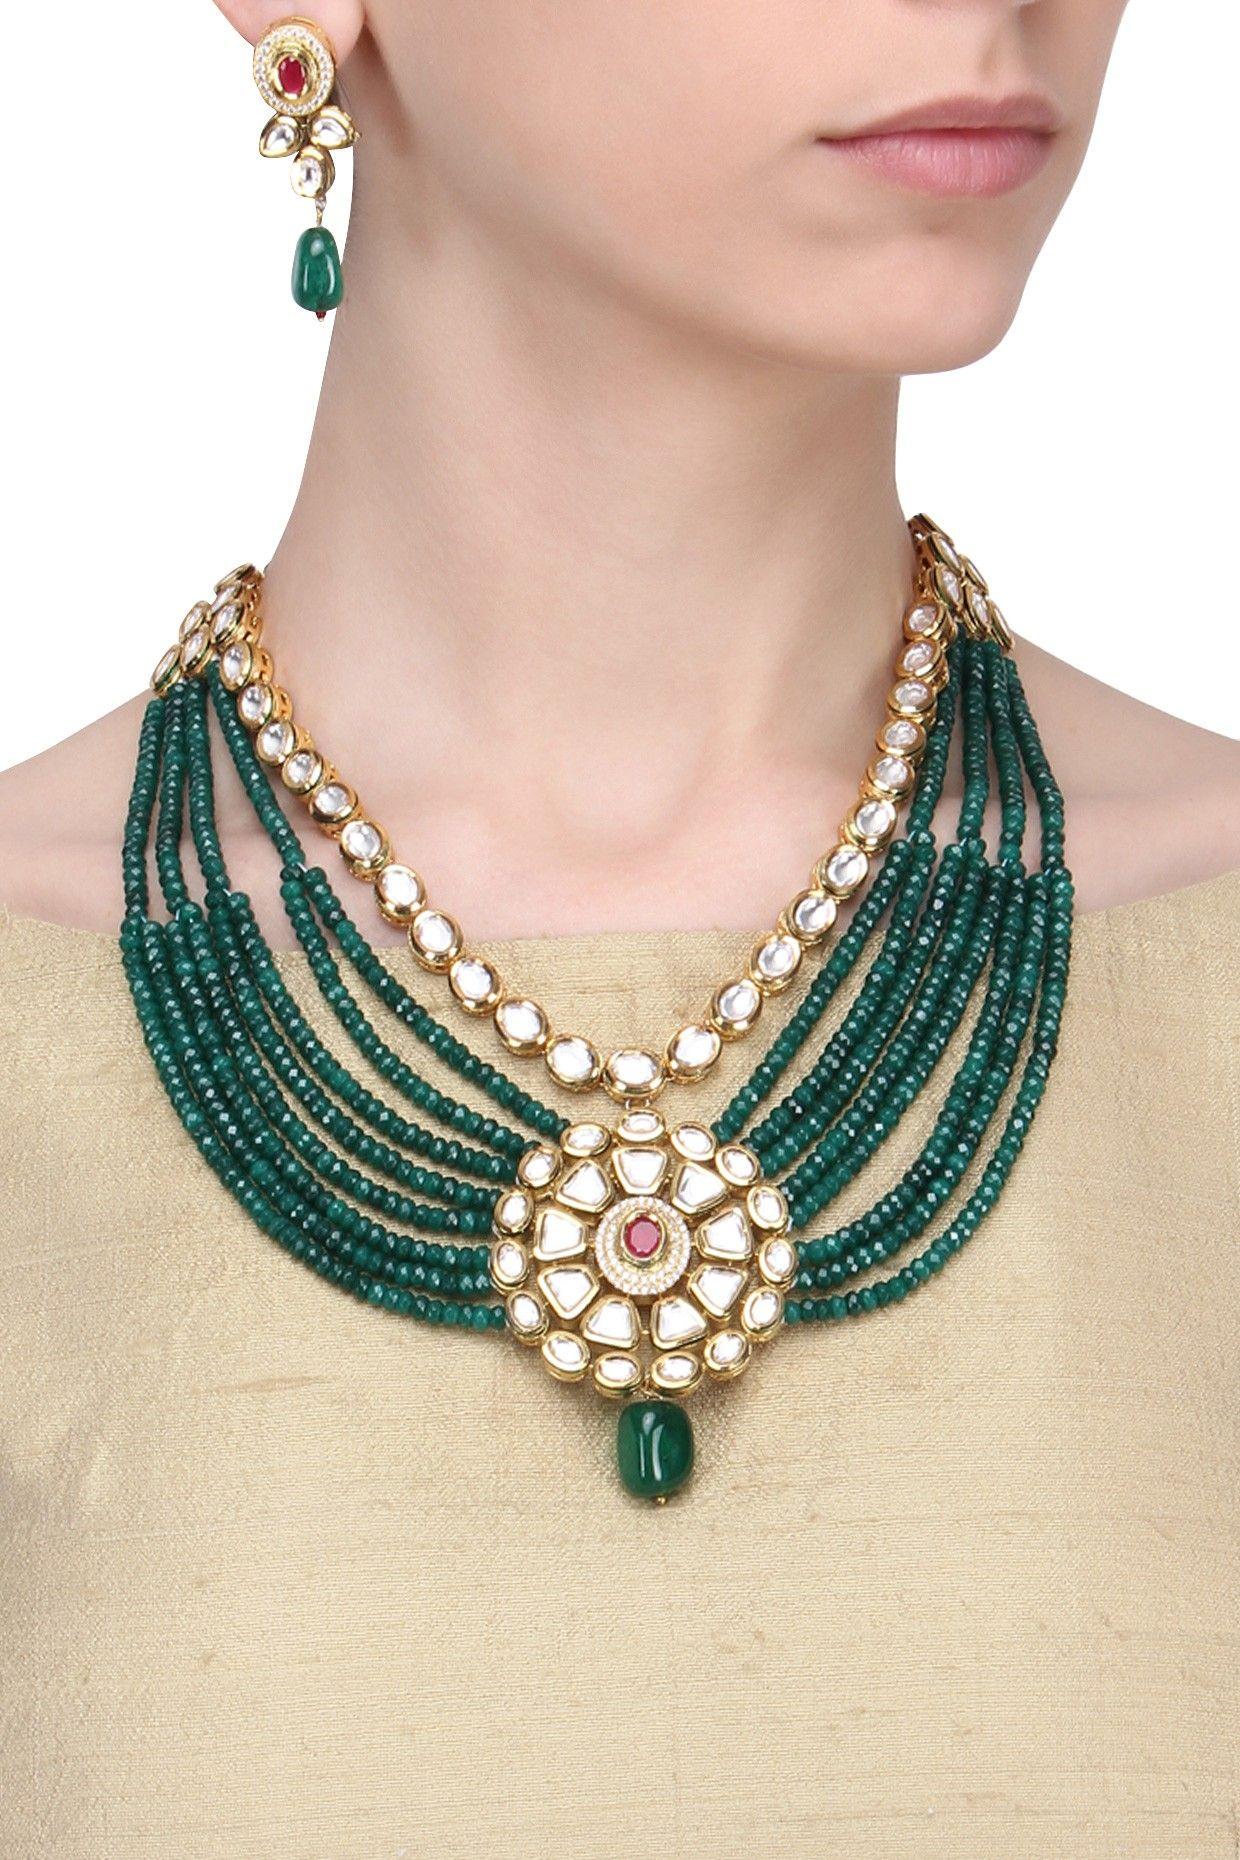 Zevar by geeta gold finish emerald and kundan stone multi strand